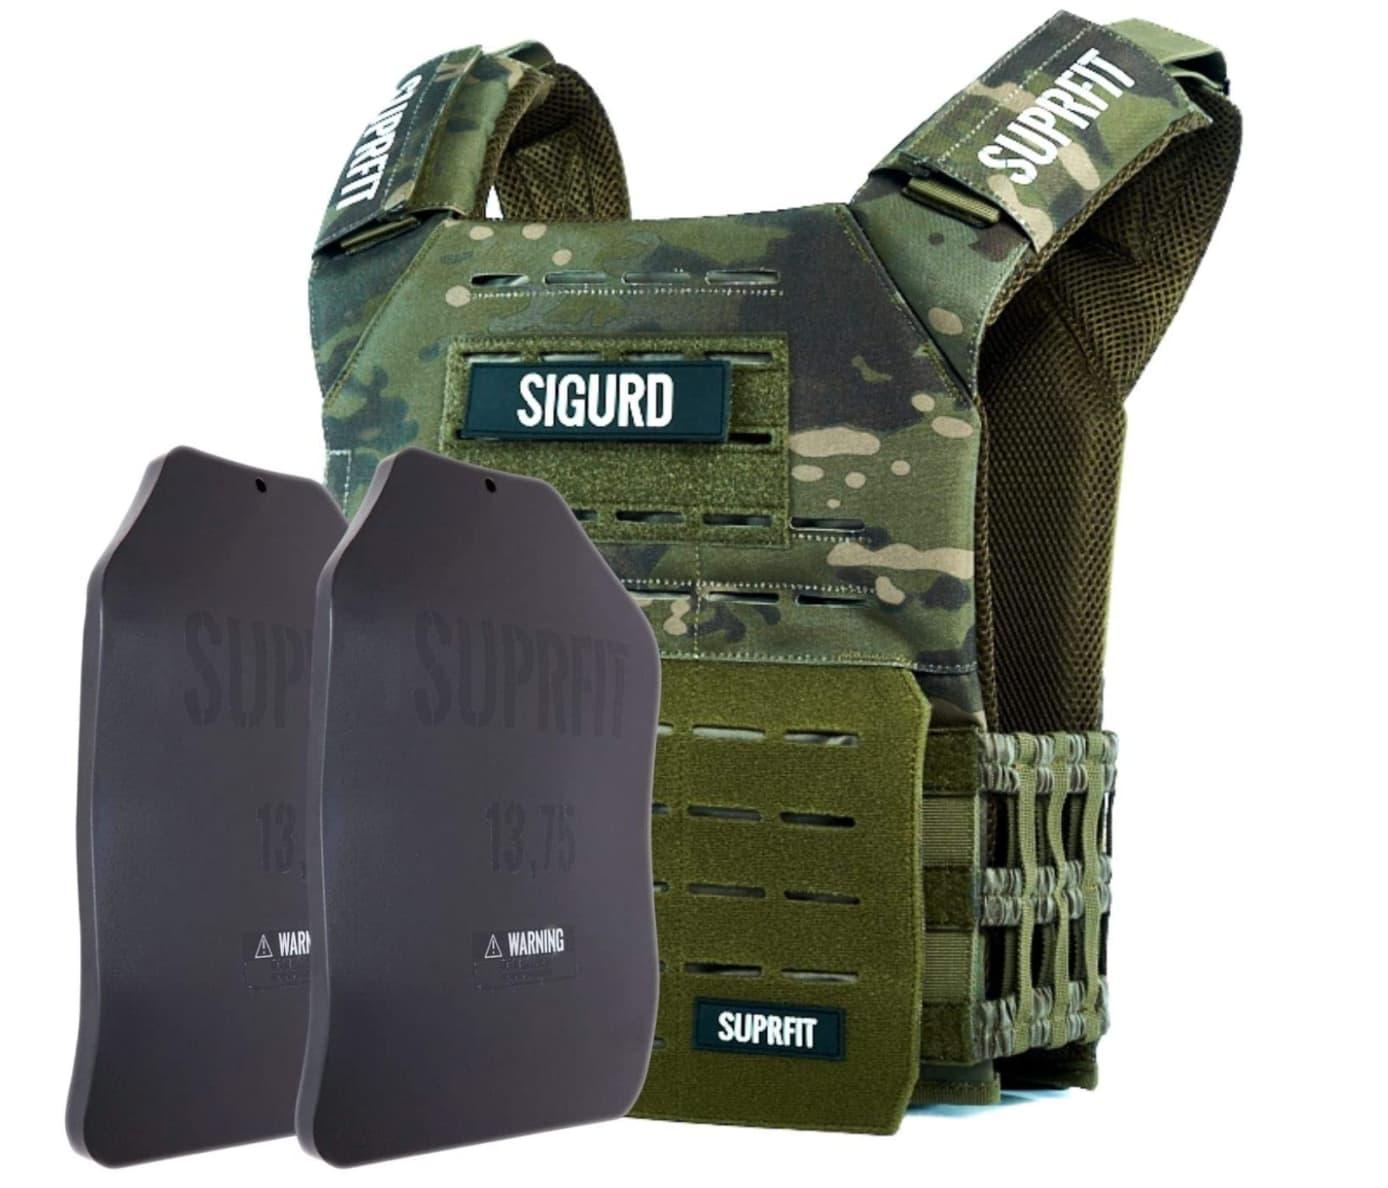 Sigurd-Trainingswesten gibt es auch in Military-Optik (ca. 180 Euro). Foto: Amazon.de